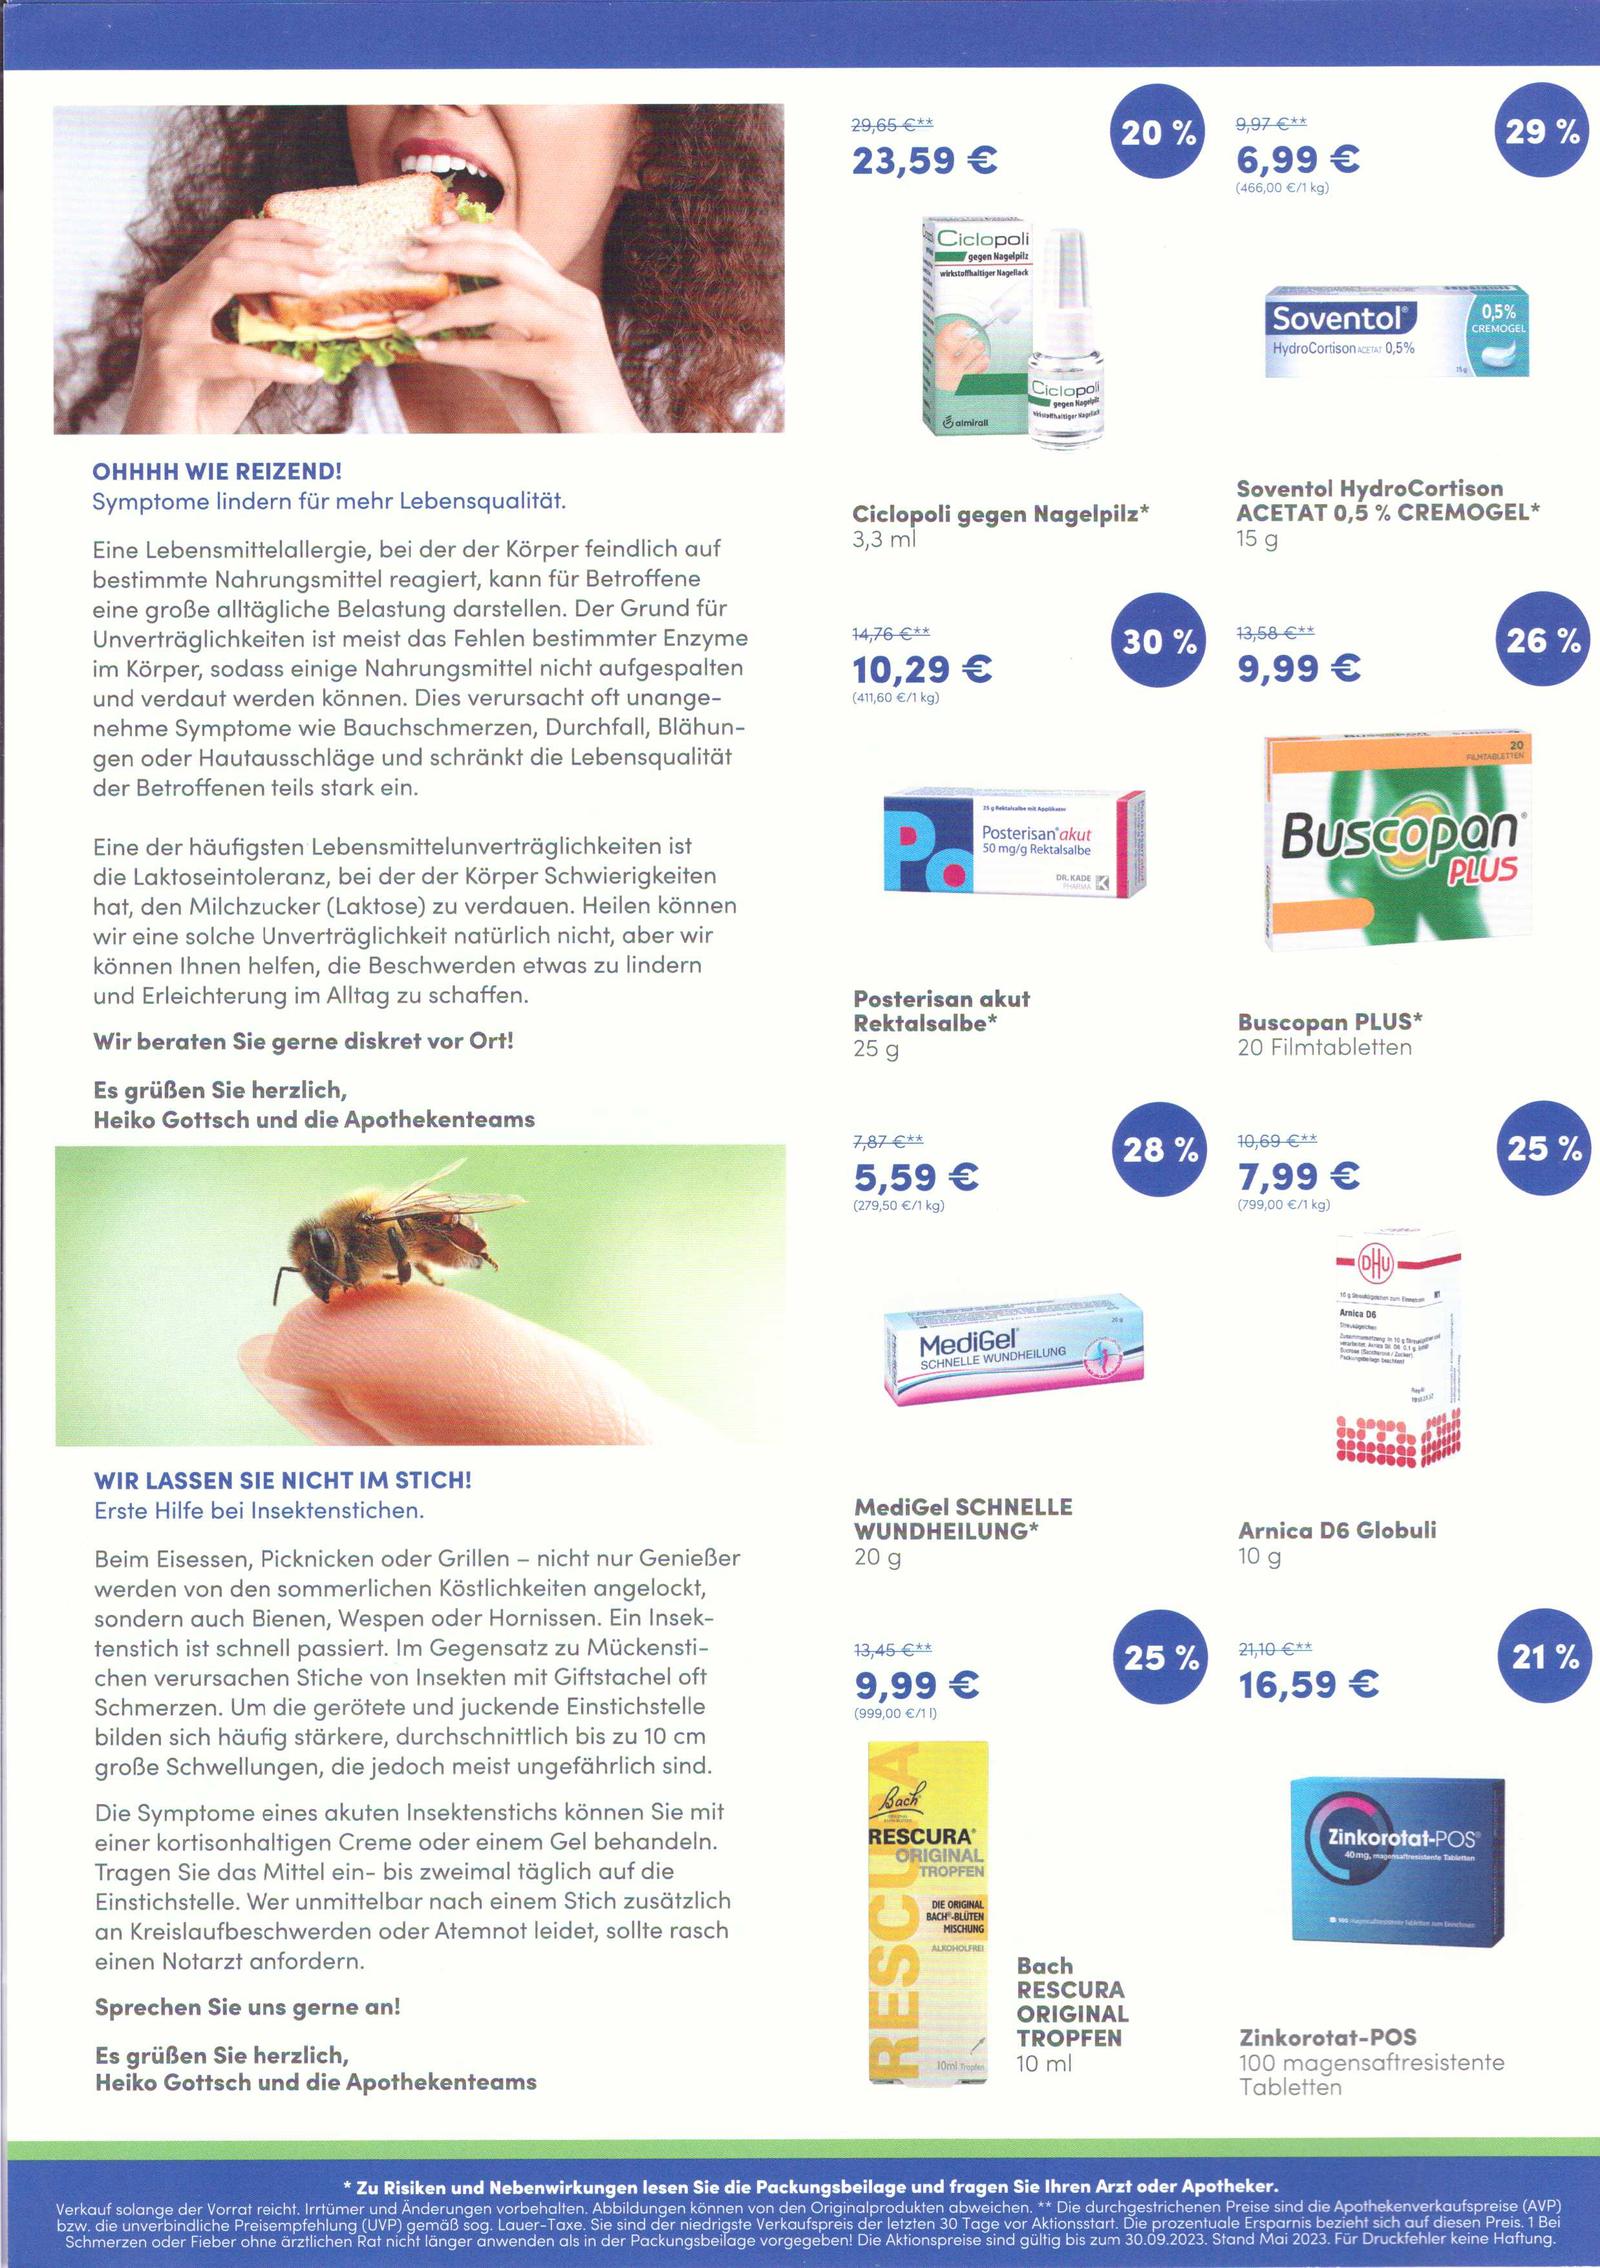 https://mein-uploads.apocdn.net/1117/leaflets/1117_flyer-Seite2.png